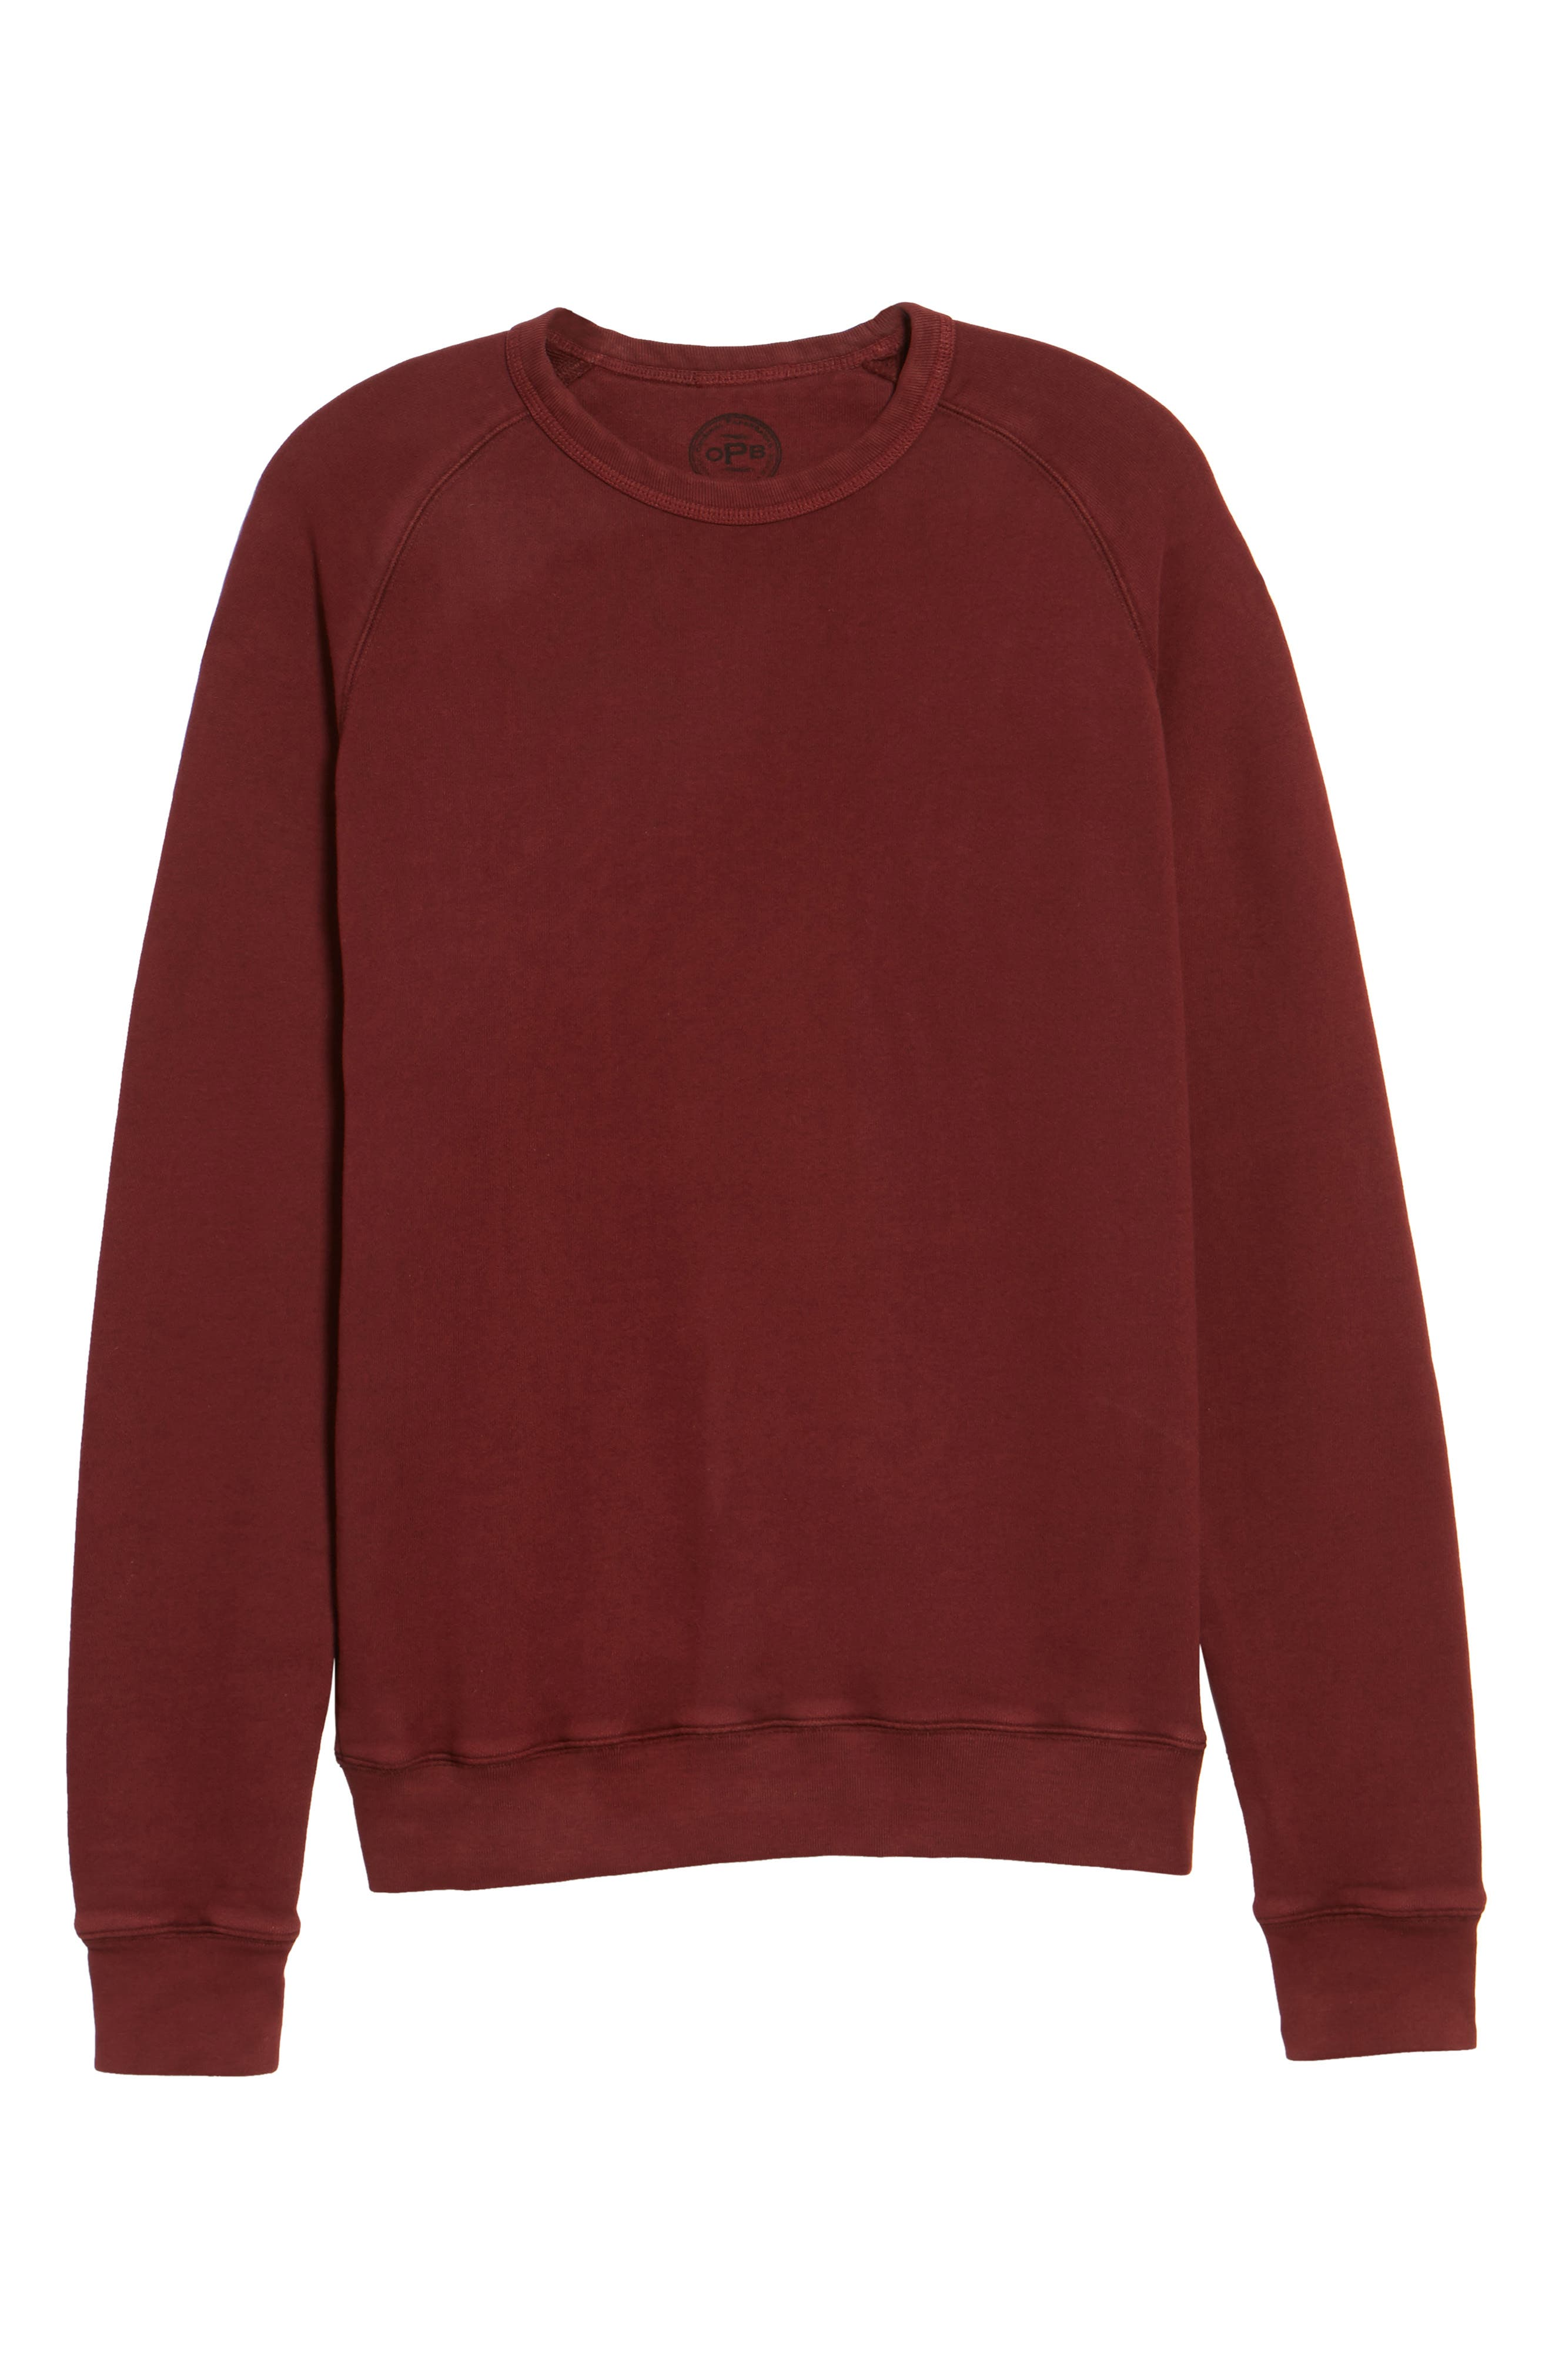 South Sea Raglan Sweatshirt,                             Alternate thumbnail 18, color,